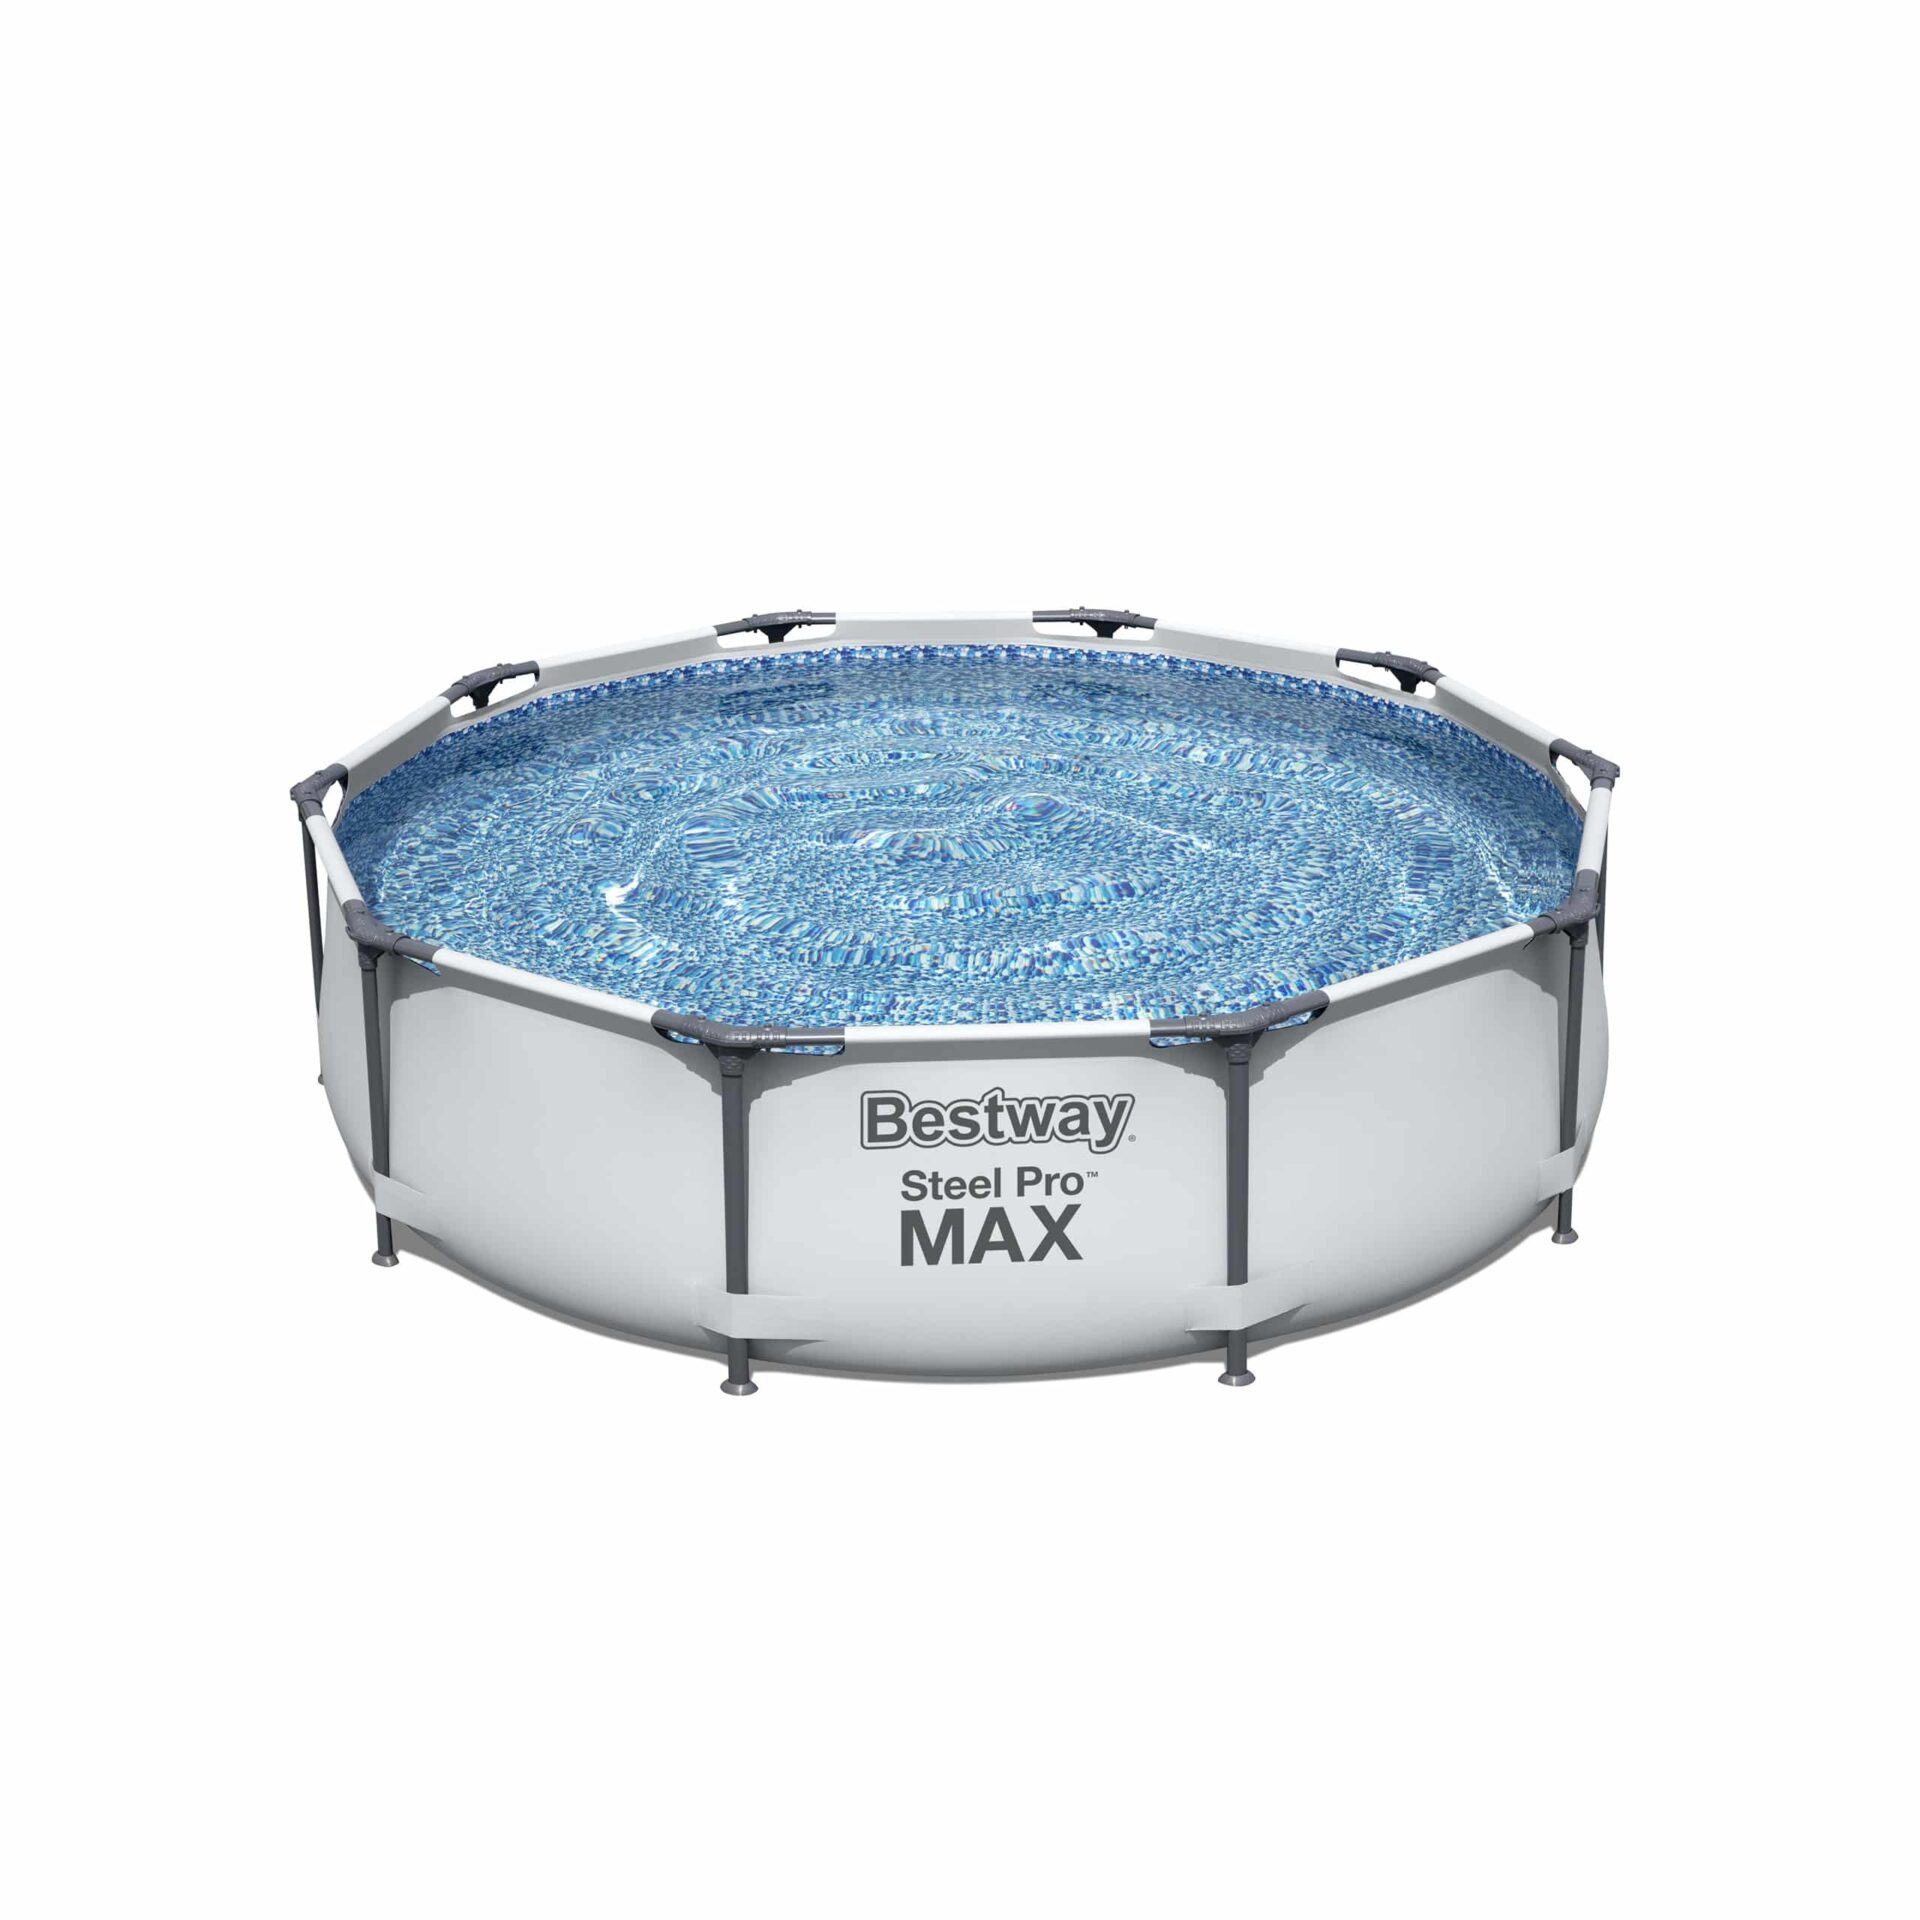 Rundt-Steel-Pro-MAX-bassengsett hagebasseng